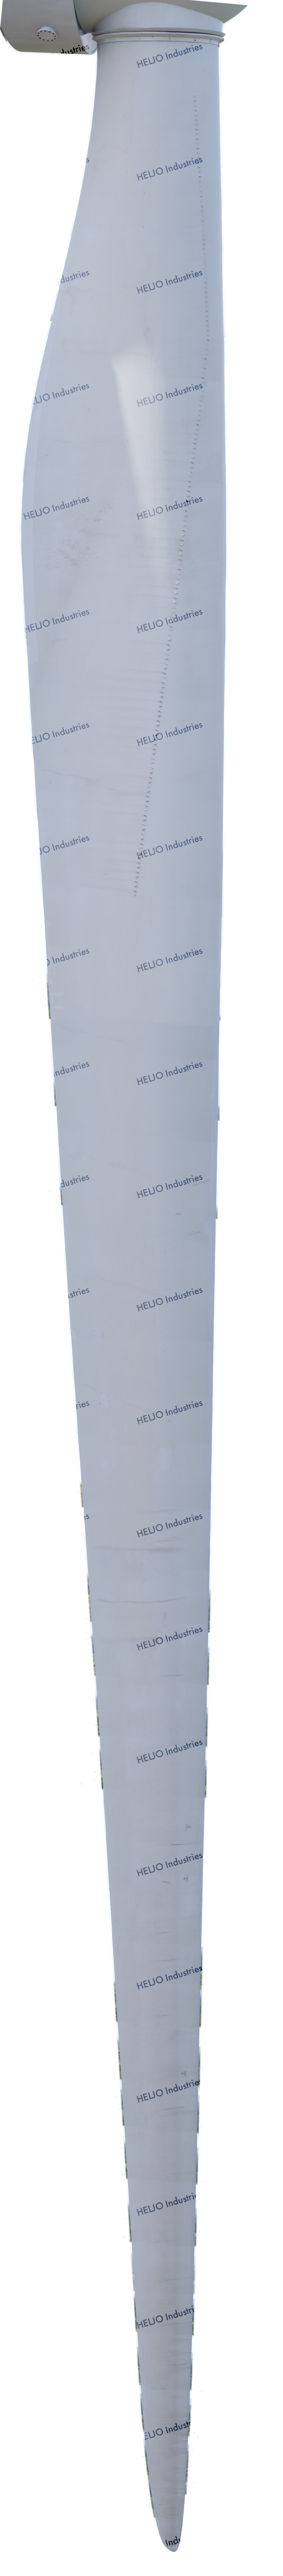 Rotorblatt Inspektion Drohne Firma HELJO Industries